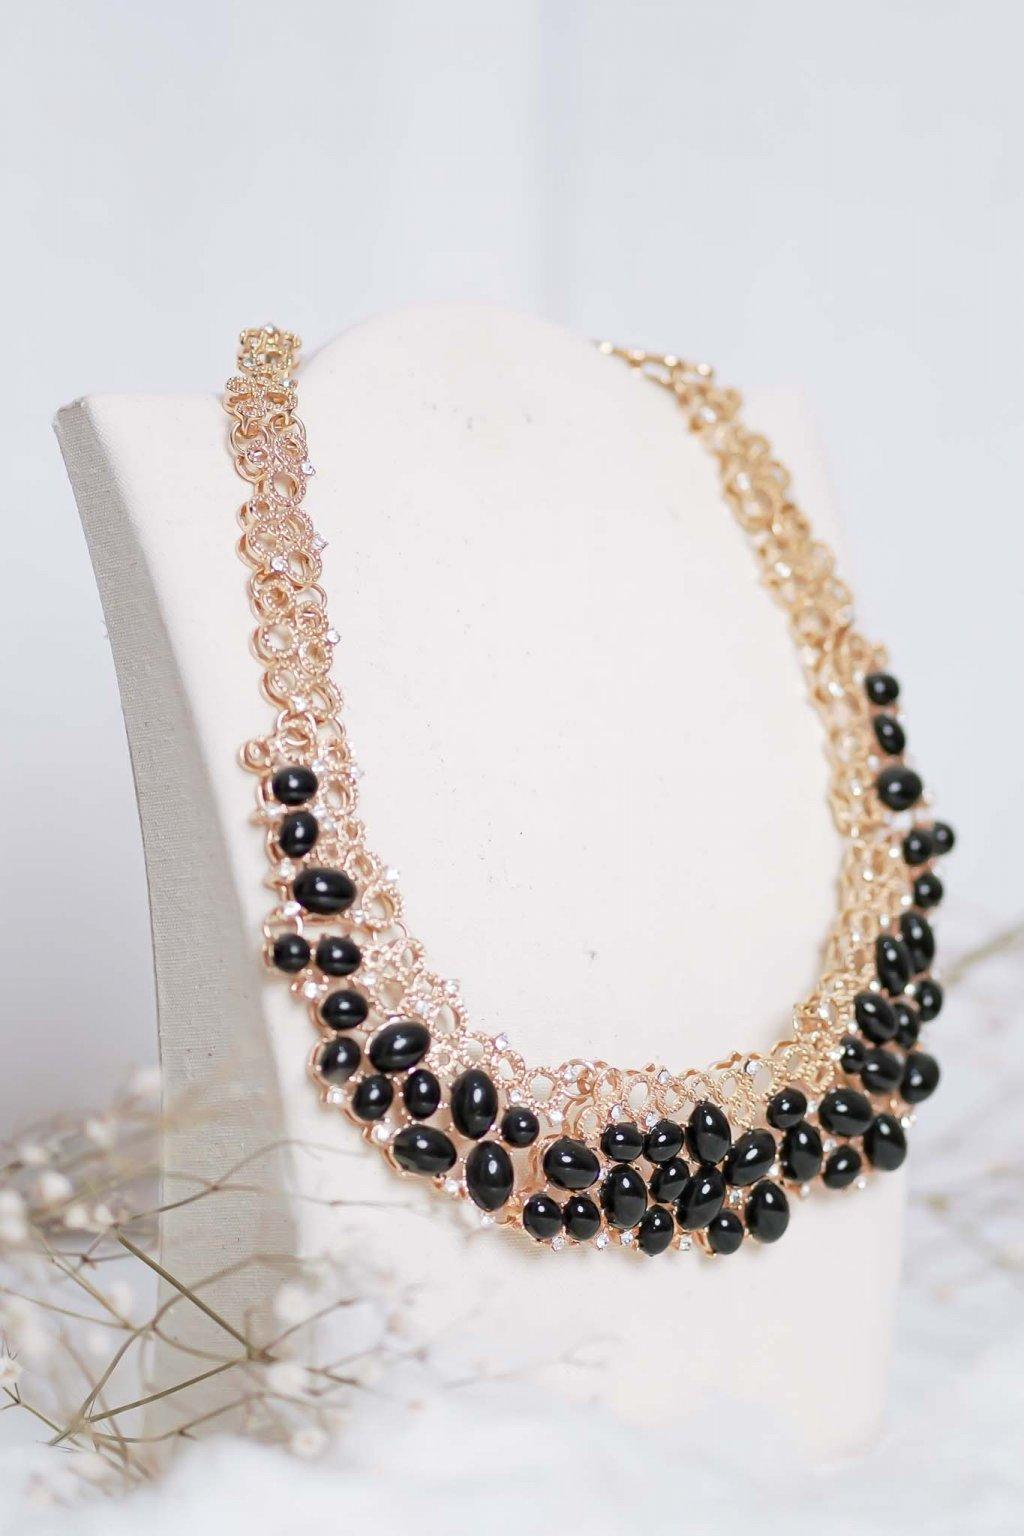 náhrdelník, šperk, spoločenská náhrdelník, náhrdelník na bežný deň, výrazný náhrdelník, jemný náhrdelník, šperky, náhrdelník na ples, svadbu, stužkovú 93